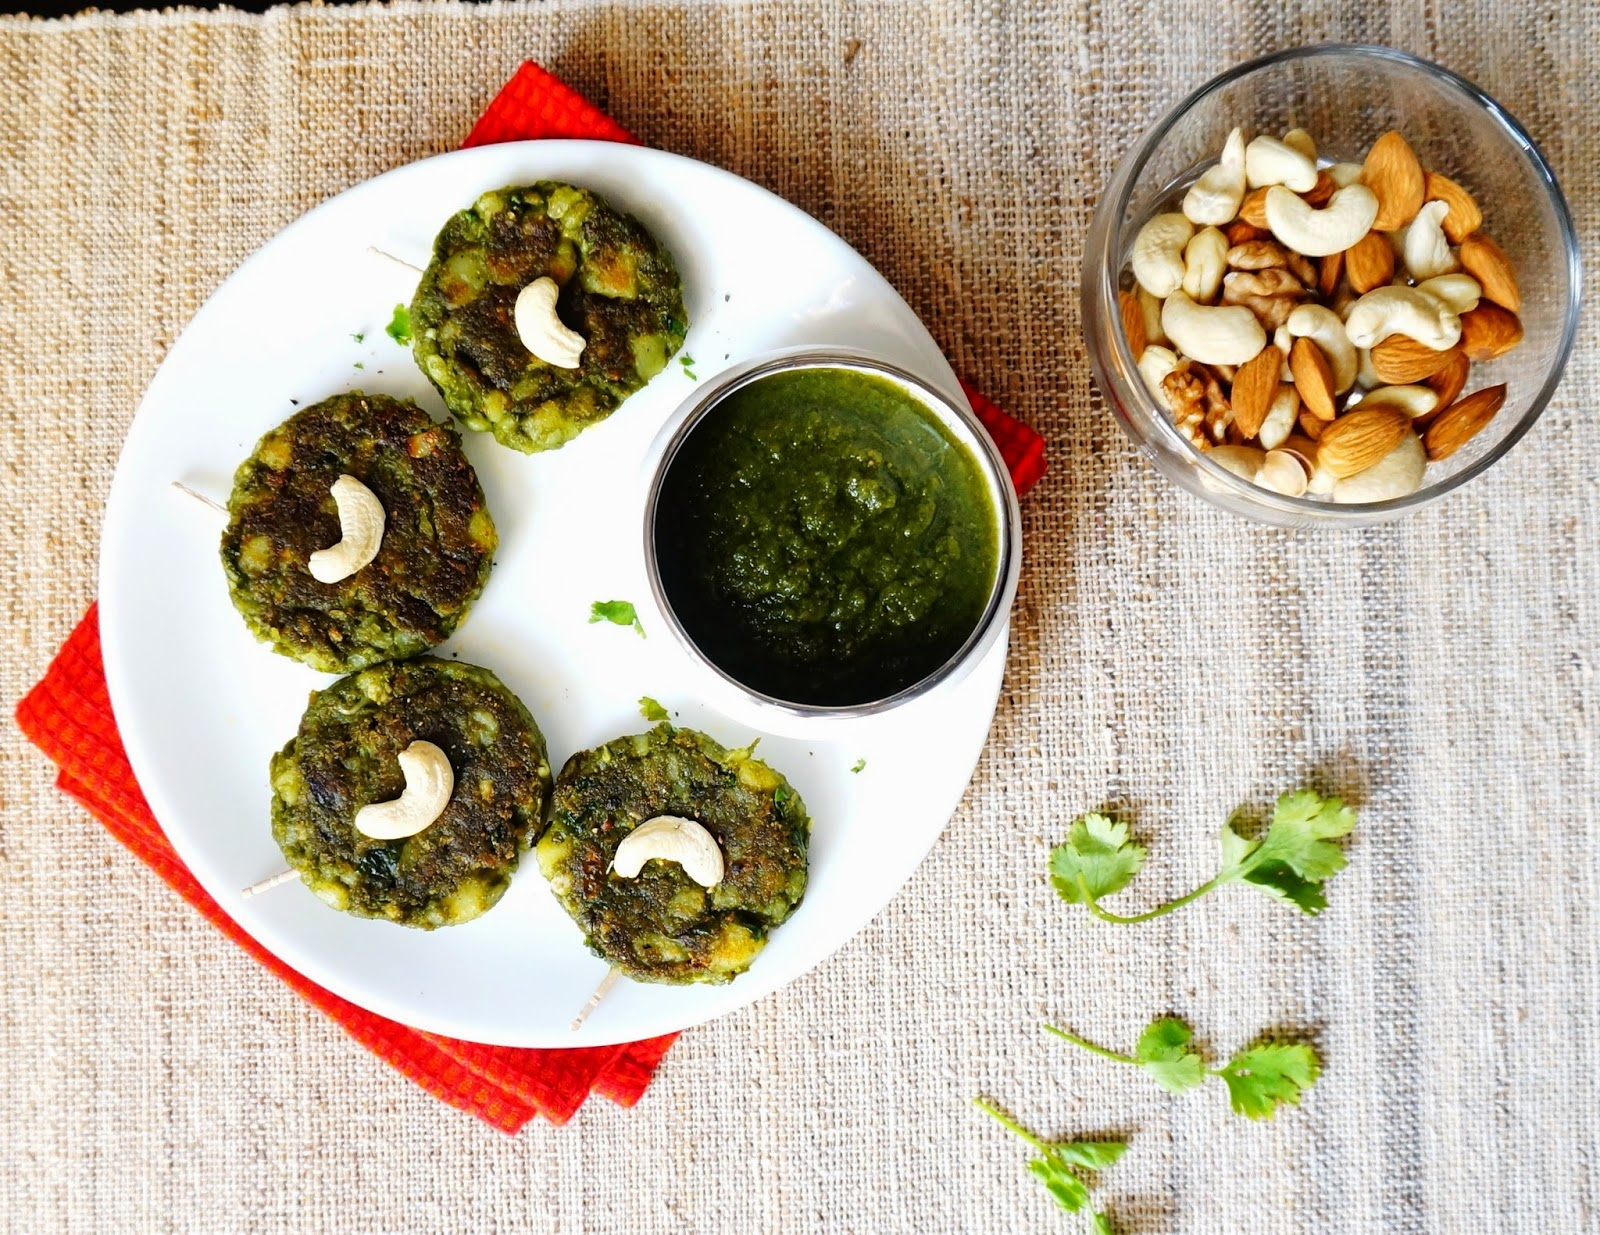 hara bhara kabab,tikki,spinach cutlets,kababs,palak tikki,,vegan,snacks